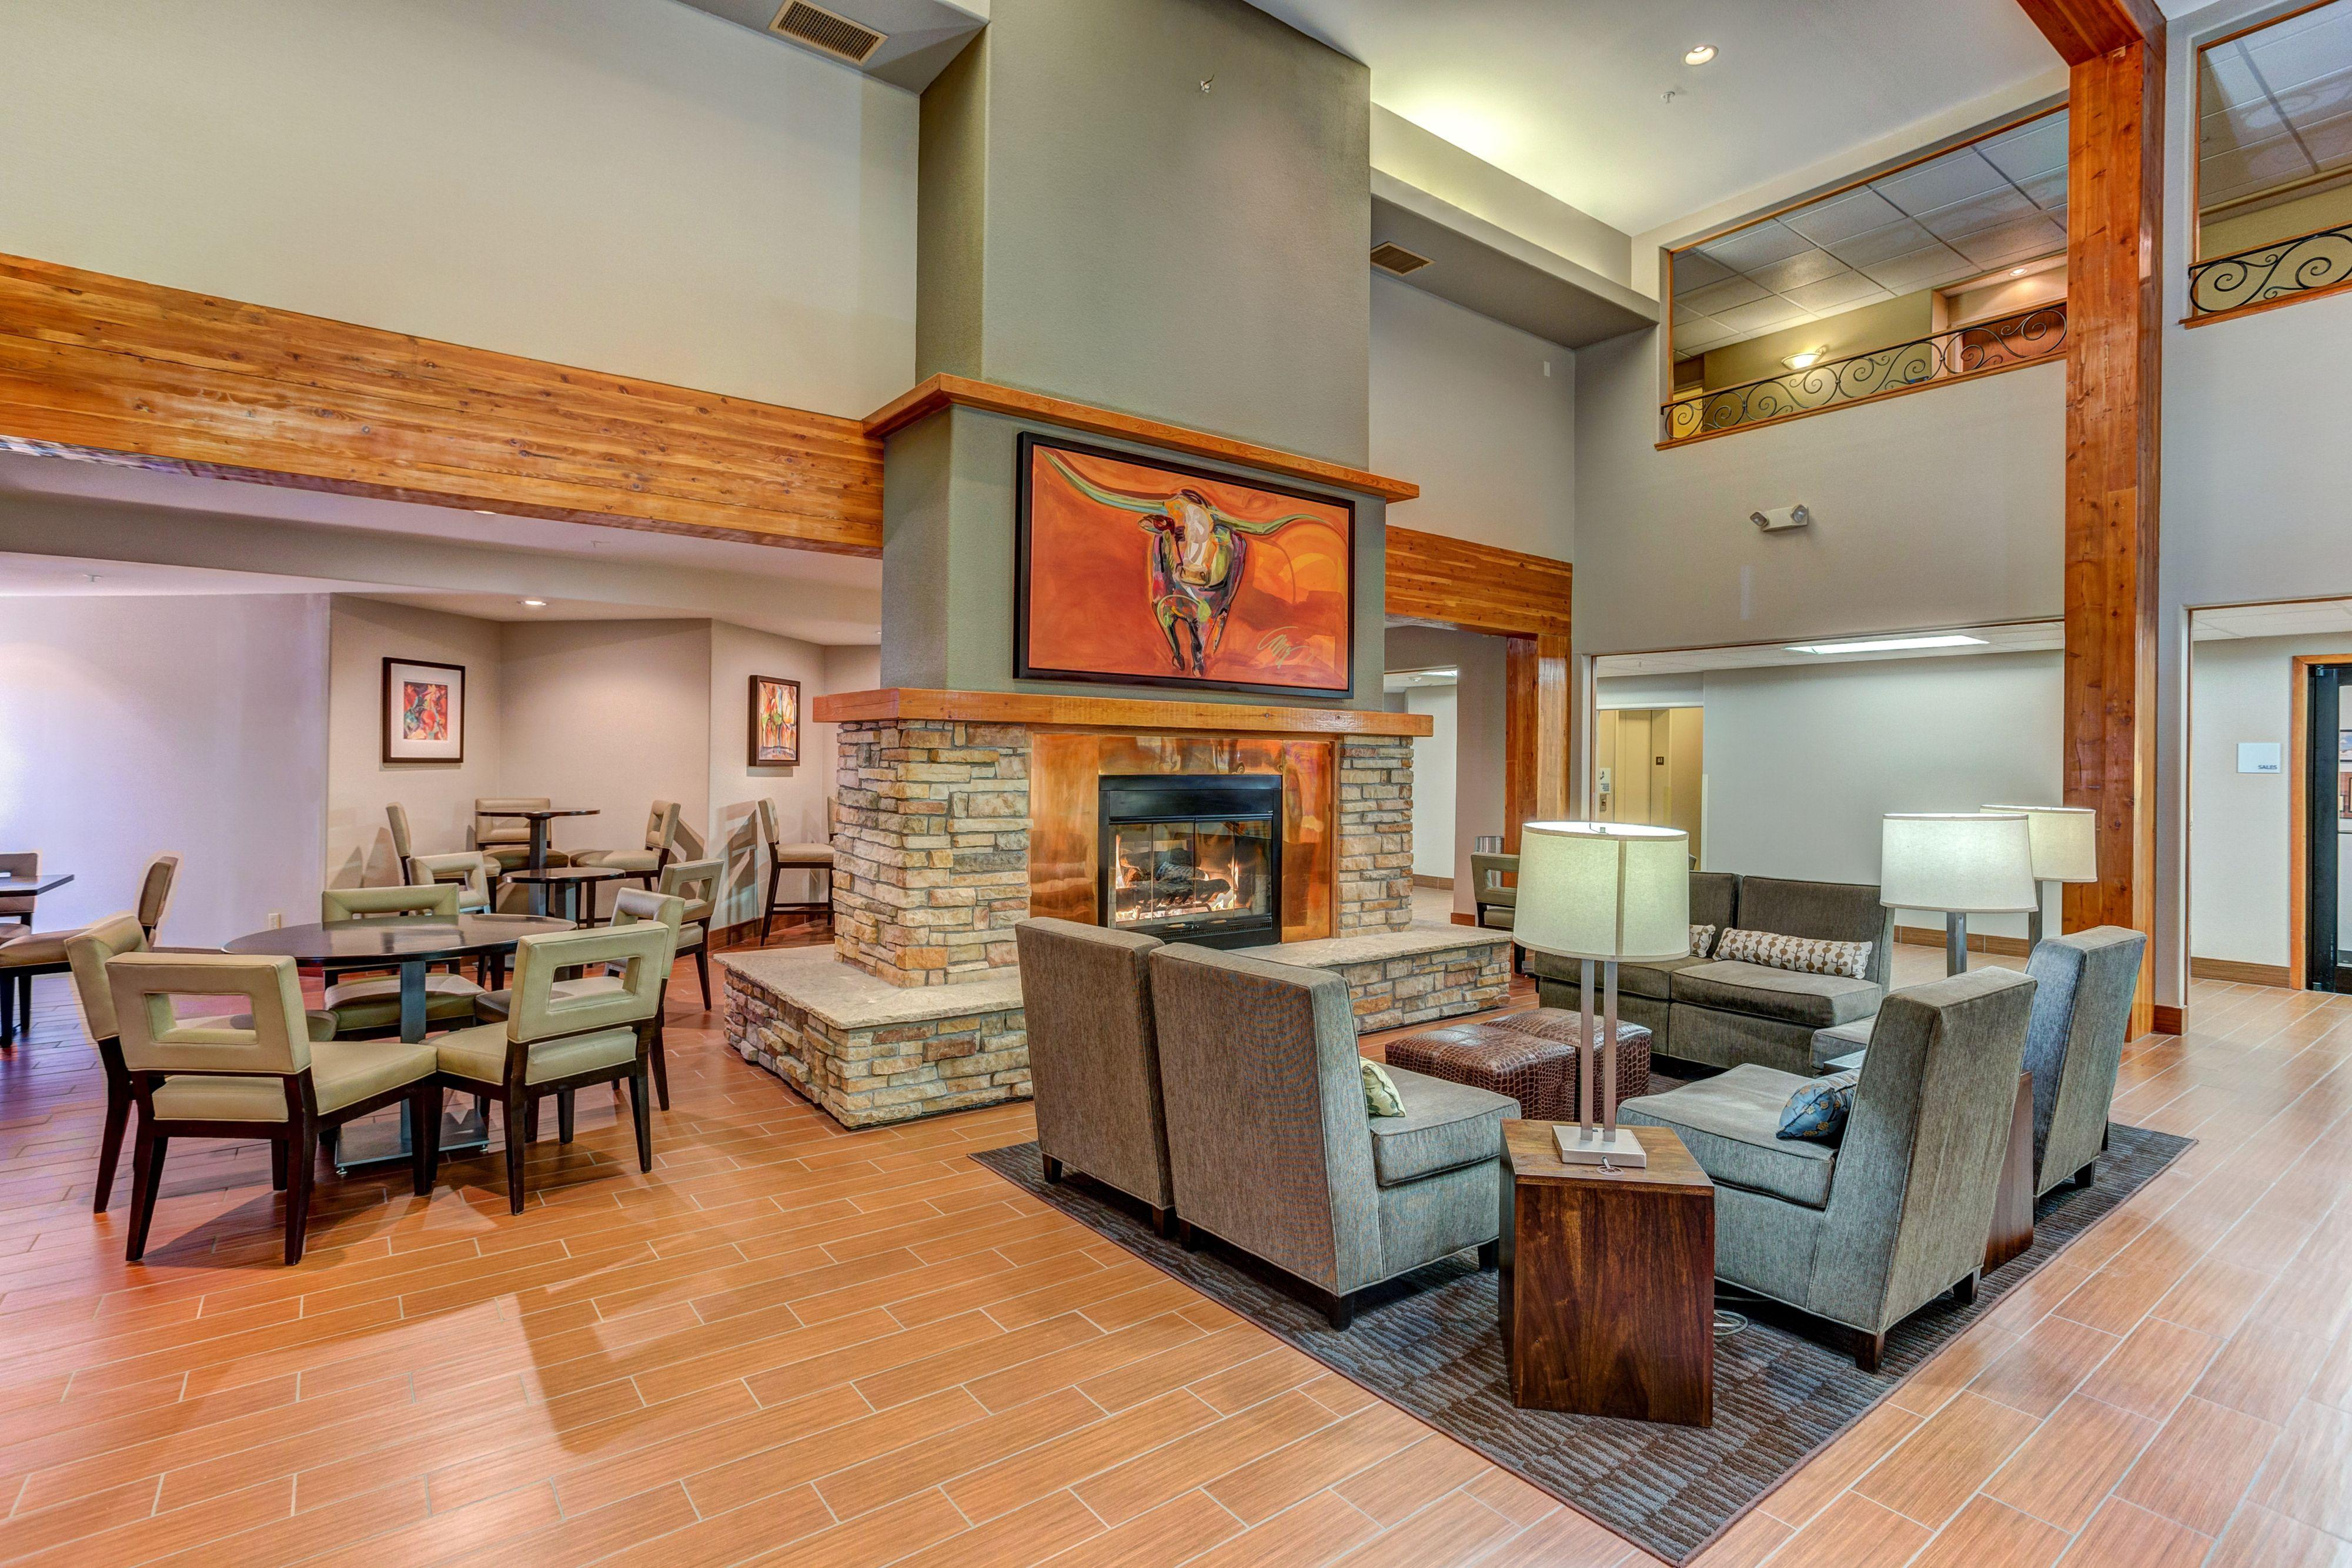 Holiday Inn Express & Suites Montrose image 4